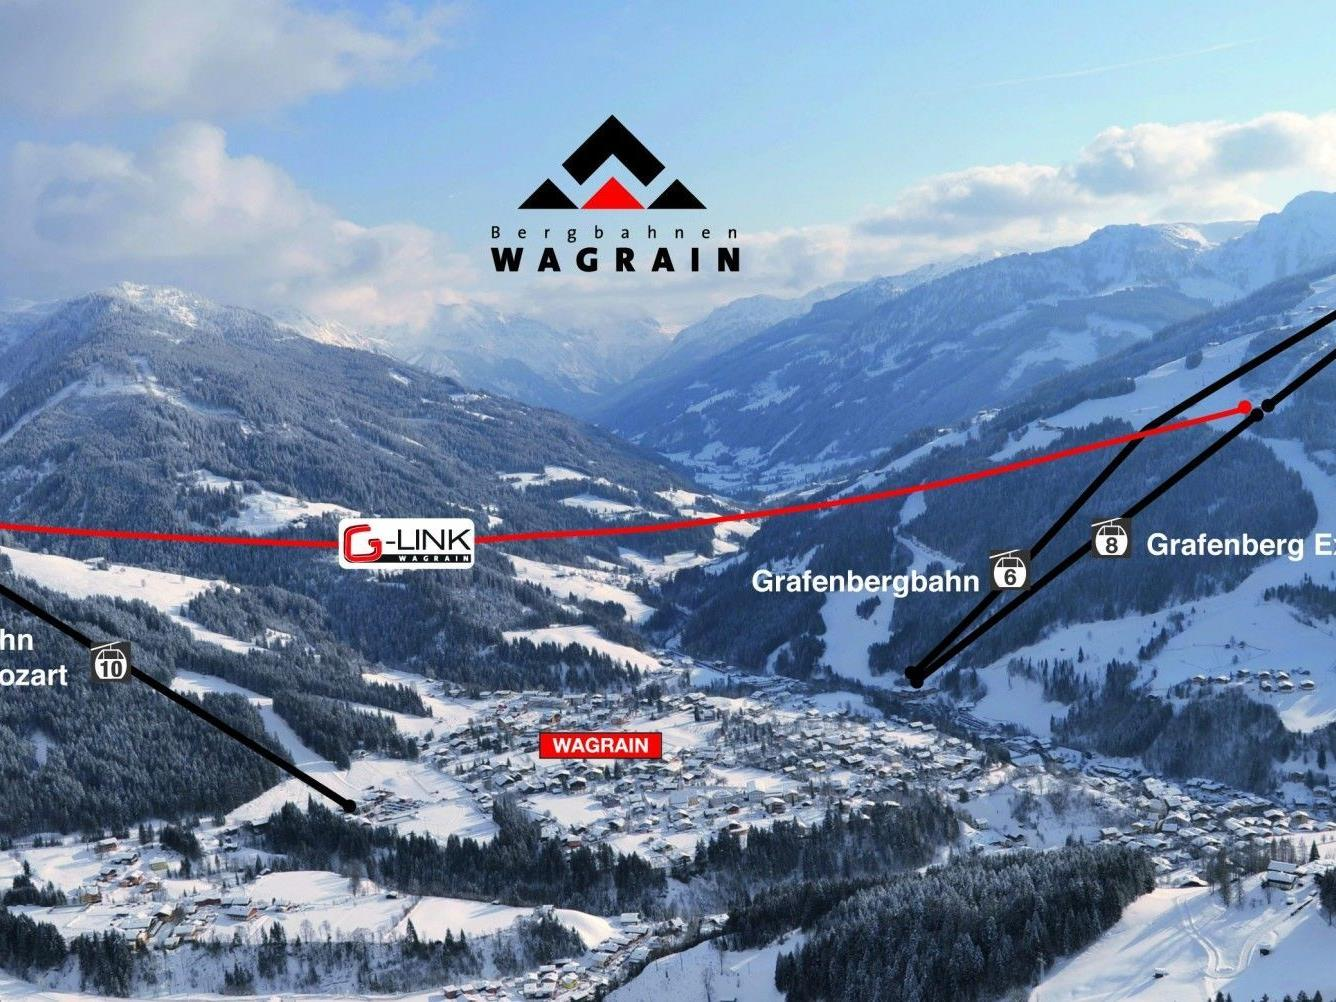 Die neue Pendelbahn verbindet ab Herbst 2013 die beiden Wagrainer Skigebiete.